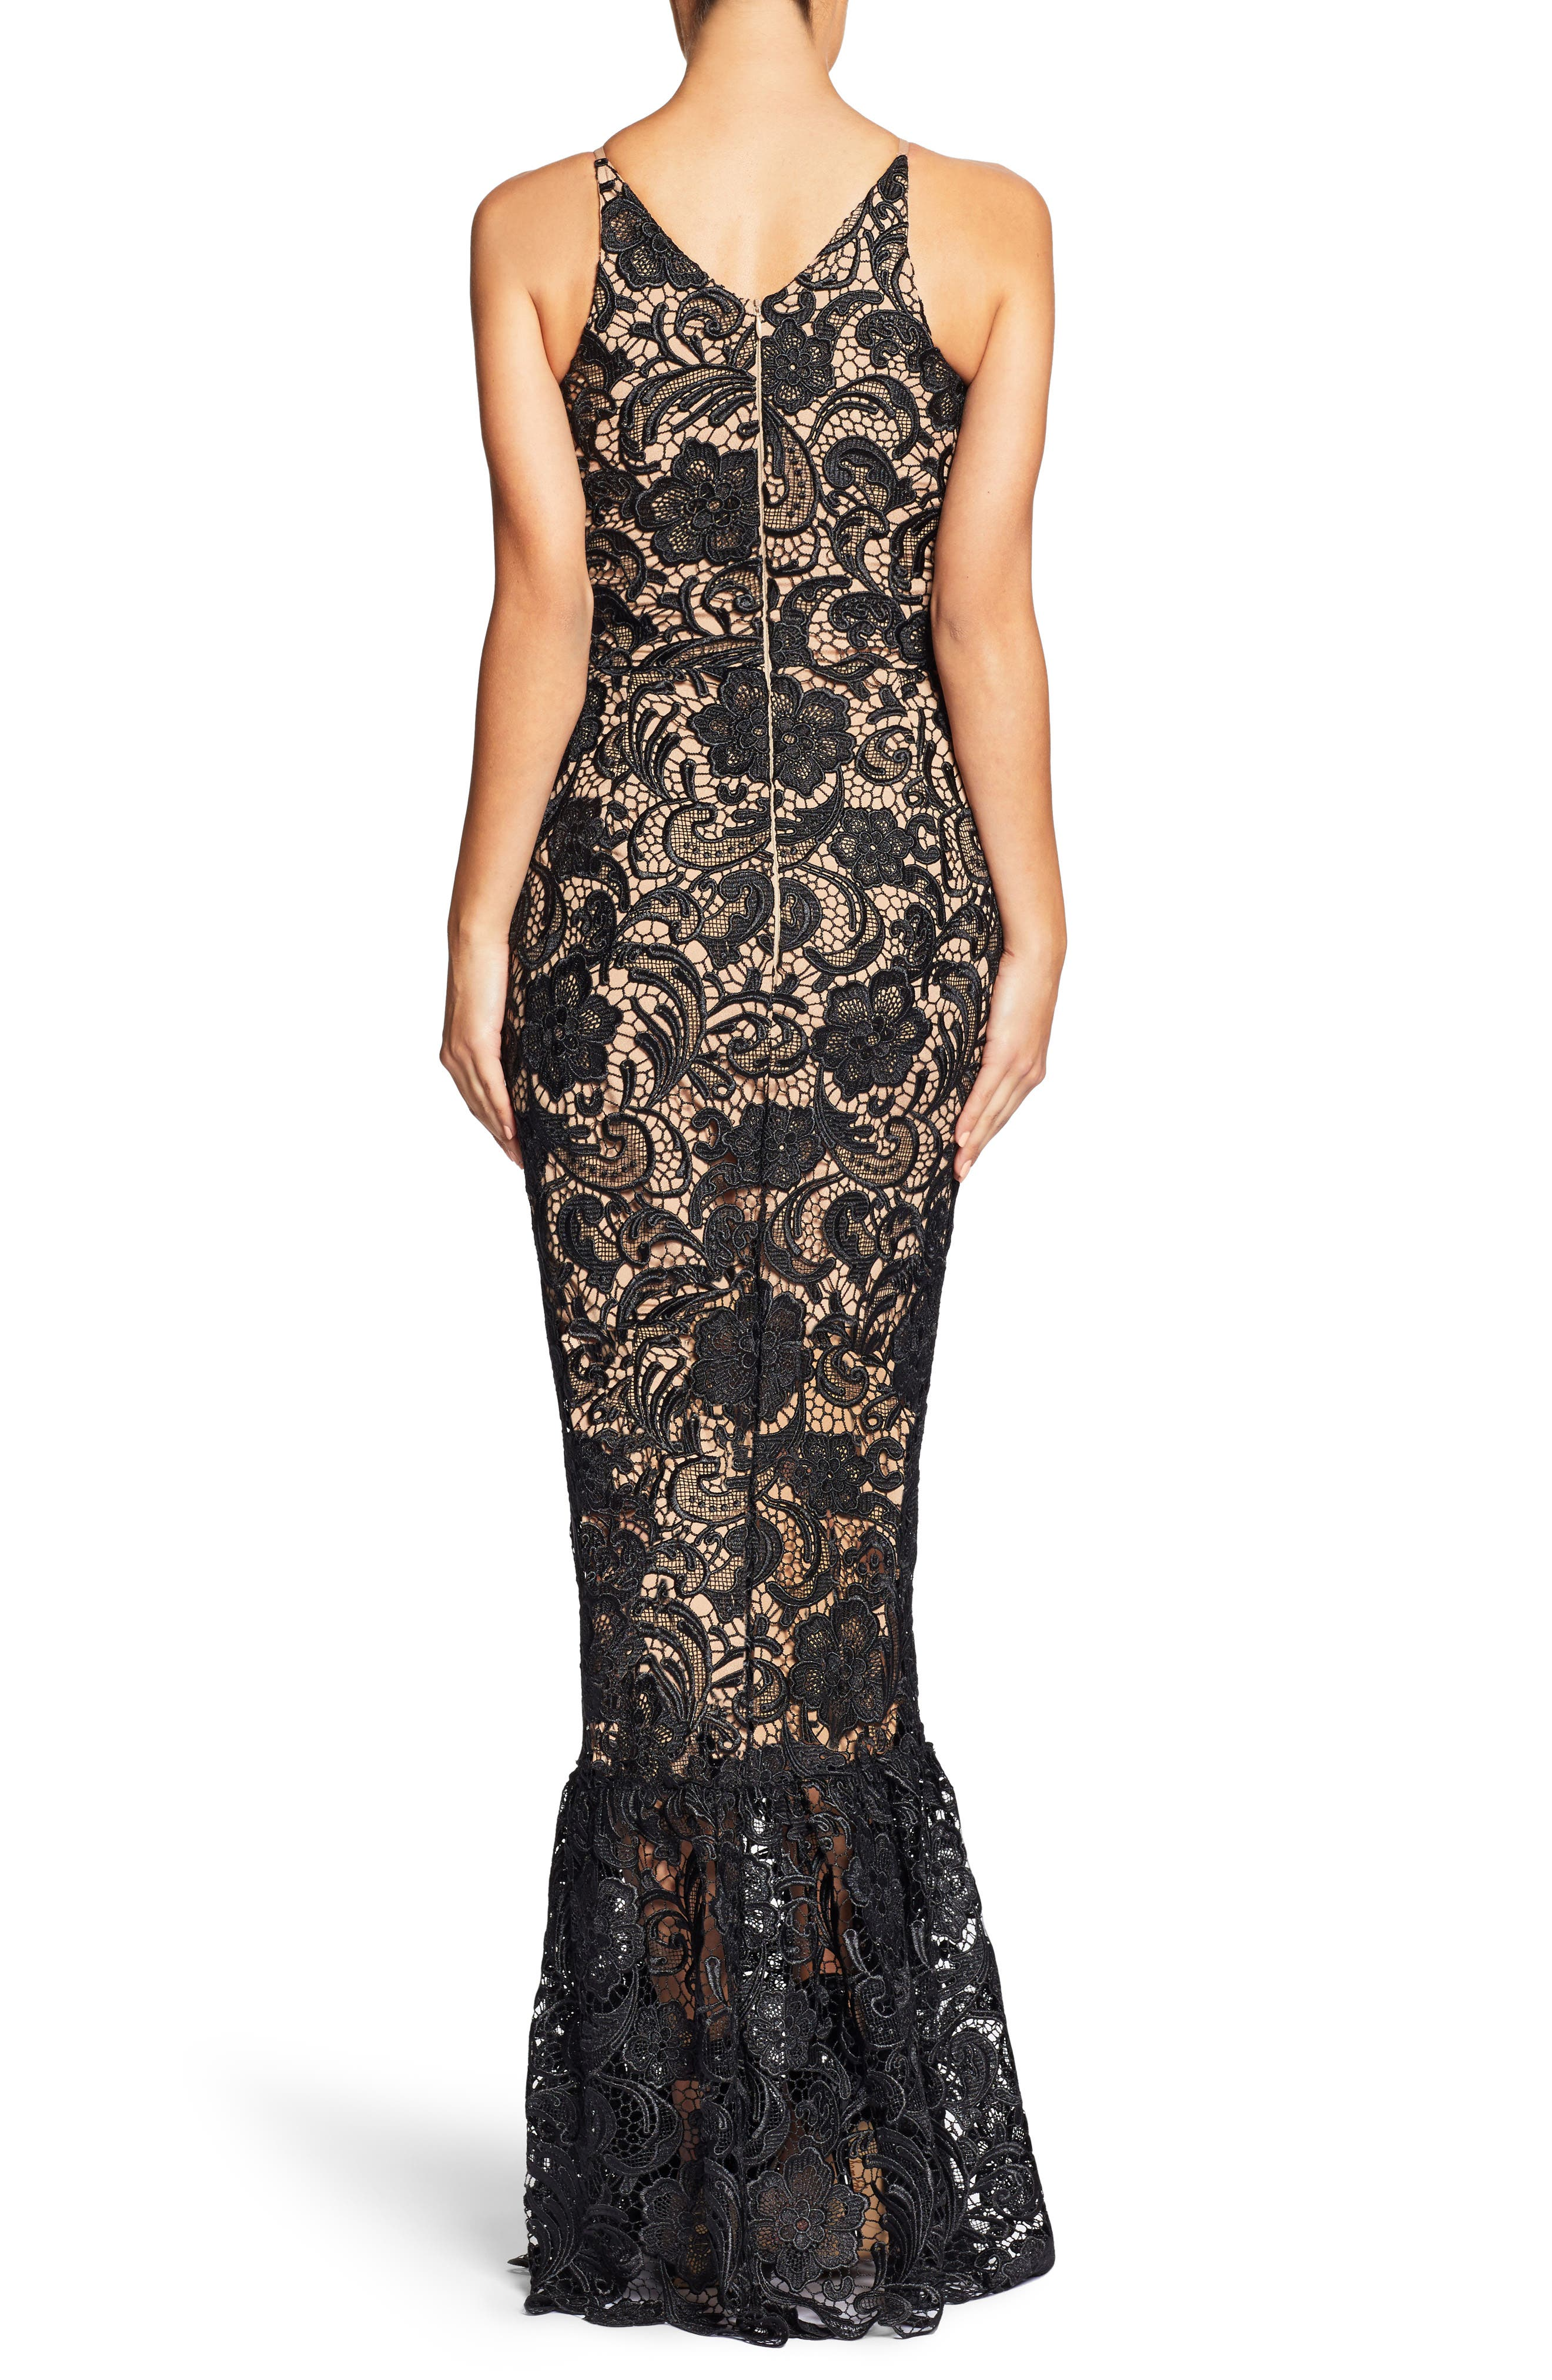 Sophia Crochet Lace Mermaid Gown,                             Alternate thumbnail 2, color,                             Black/ Nude